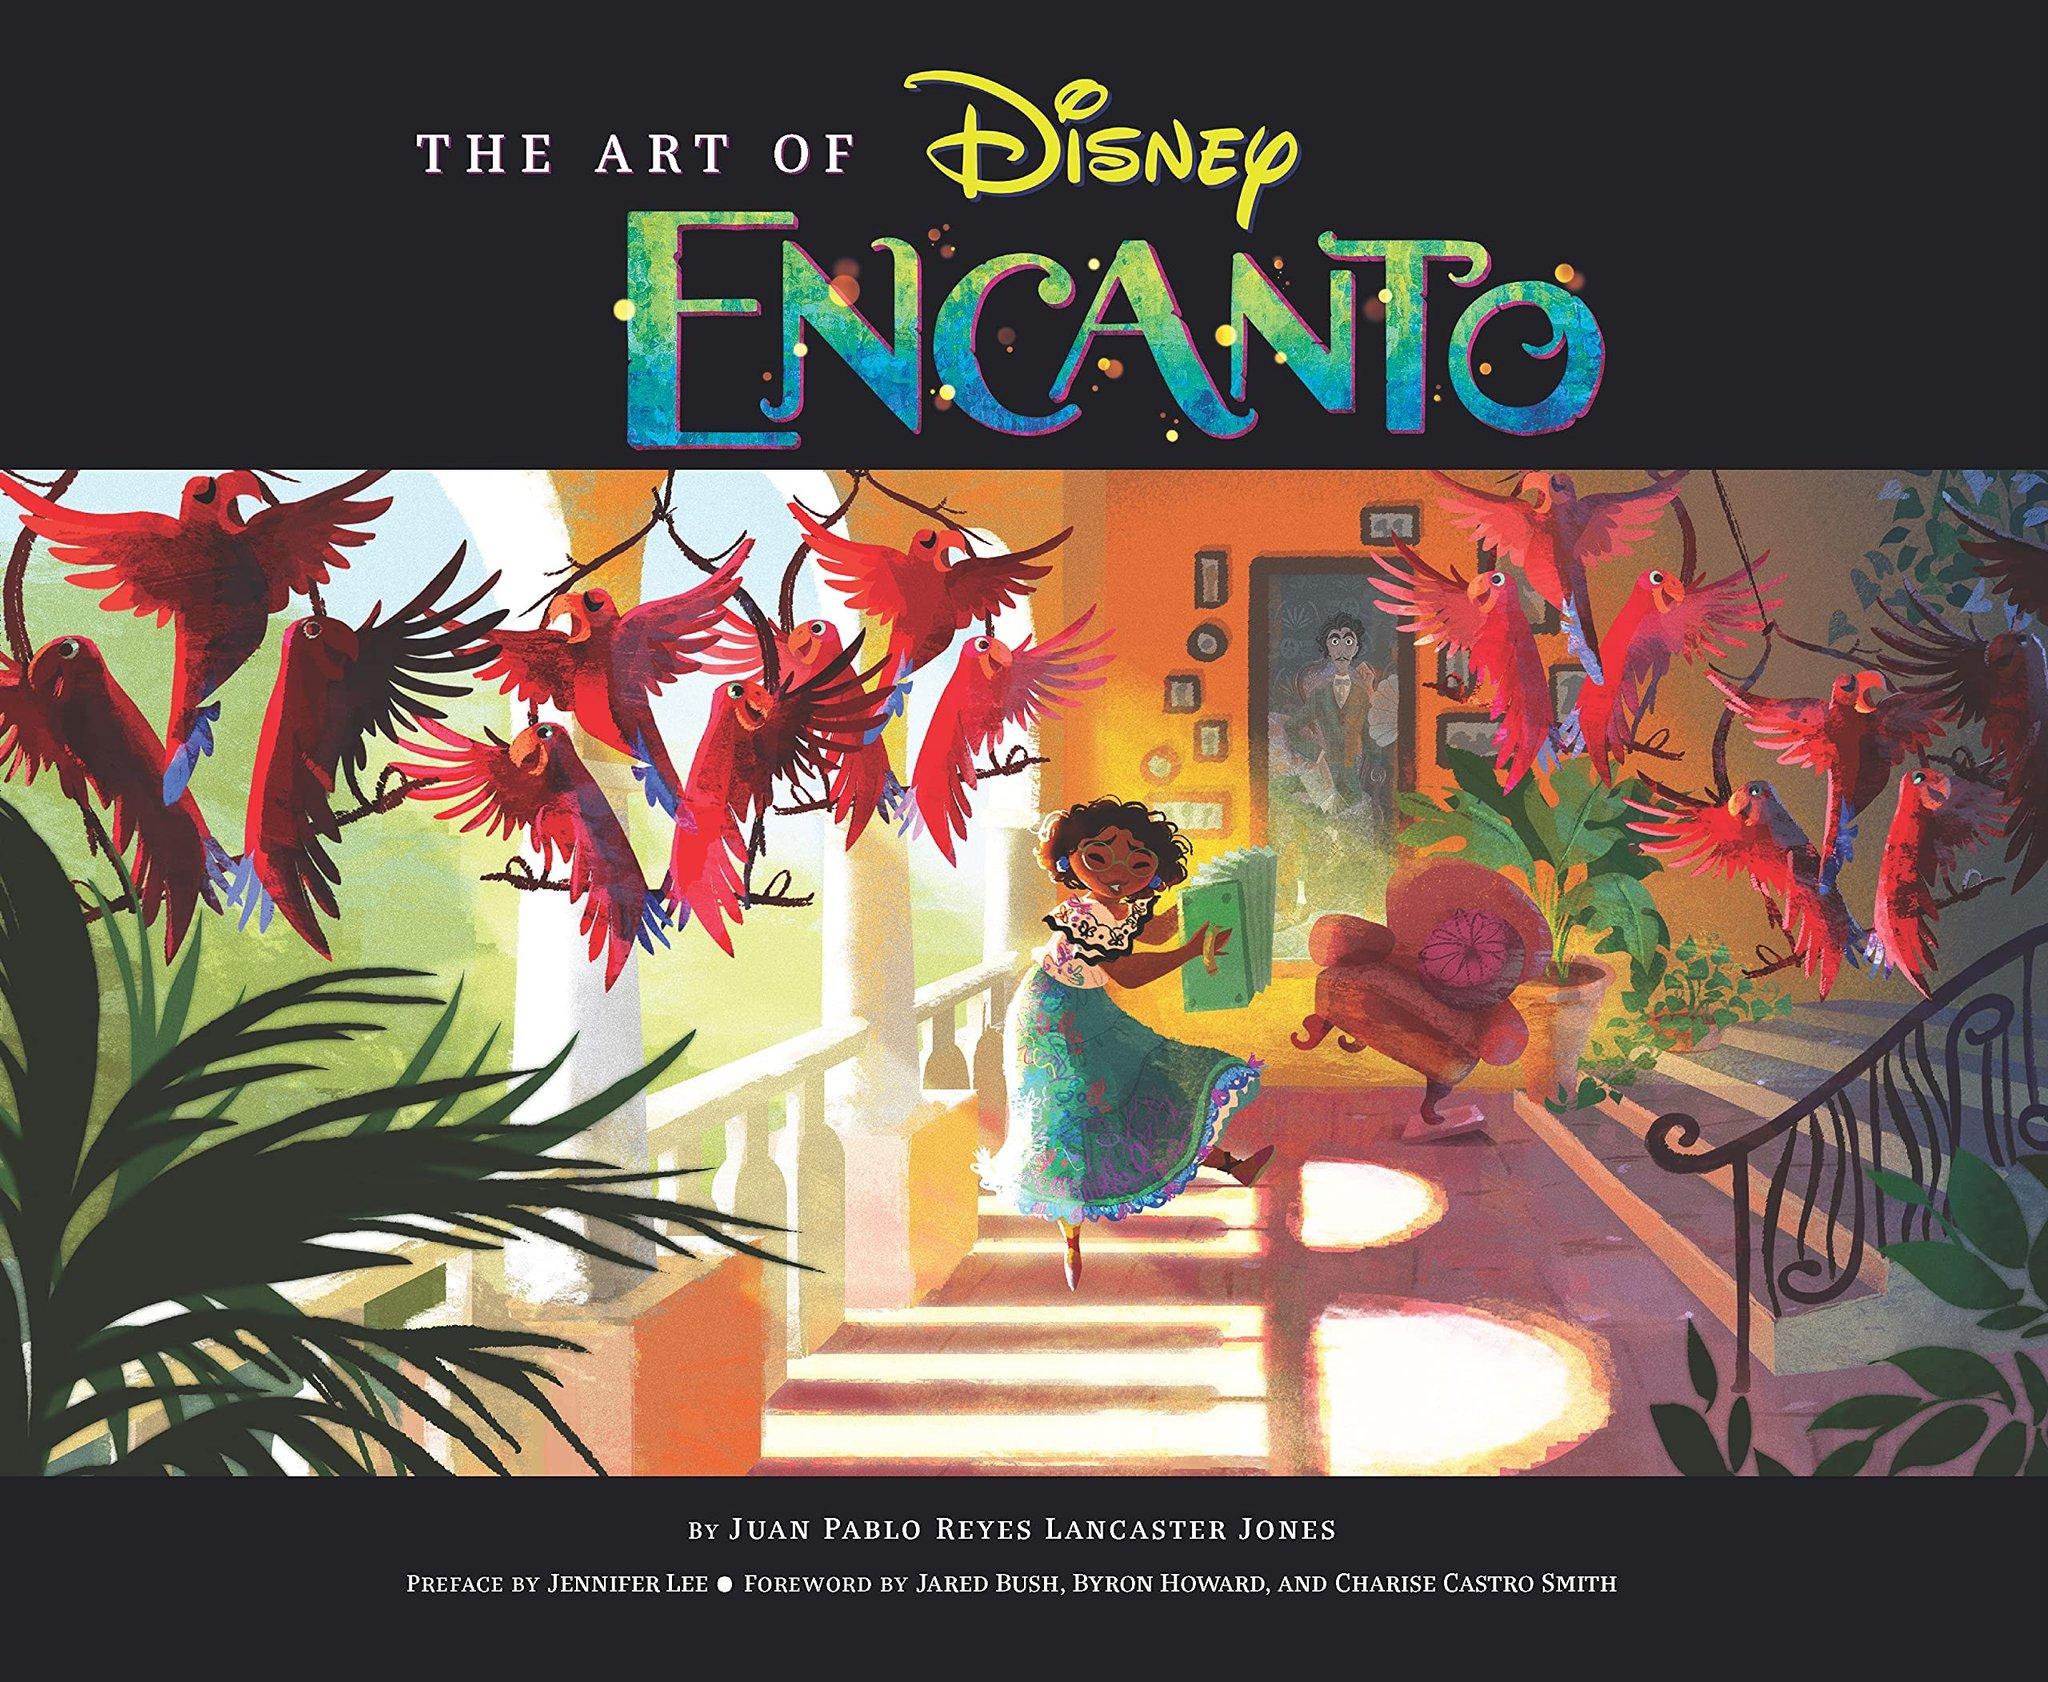 Encanto - La Fantastique Famille Madrigal [Walt Disney - 2021] - Page 4 E-X8pV_XEAMWfTh?format=jpg&name=large